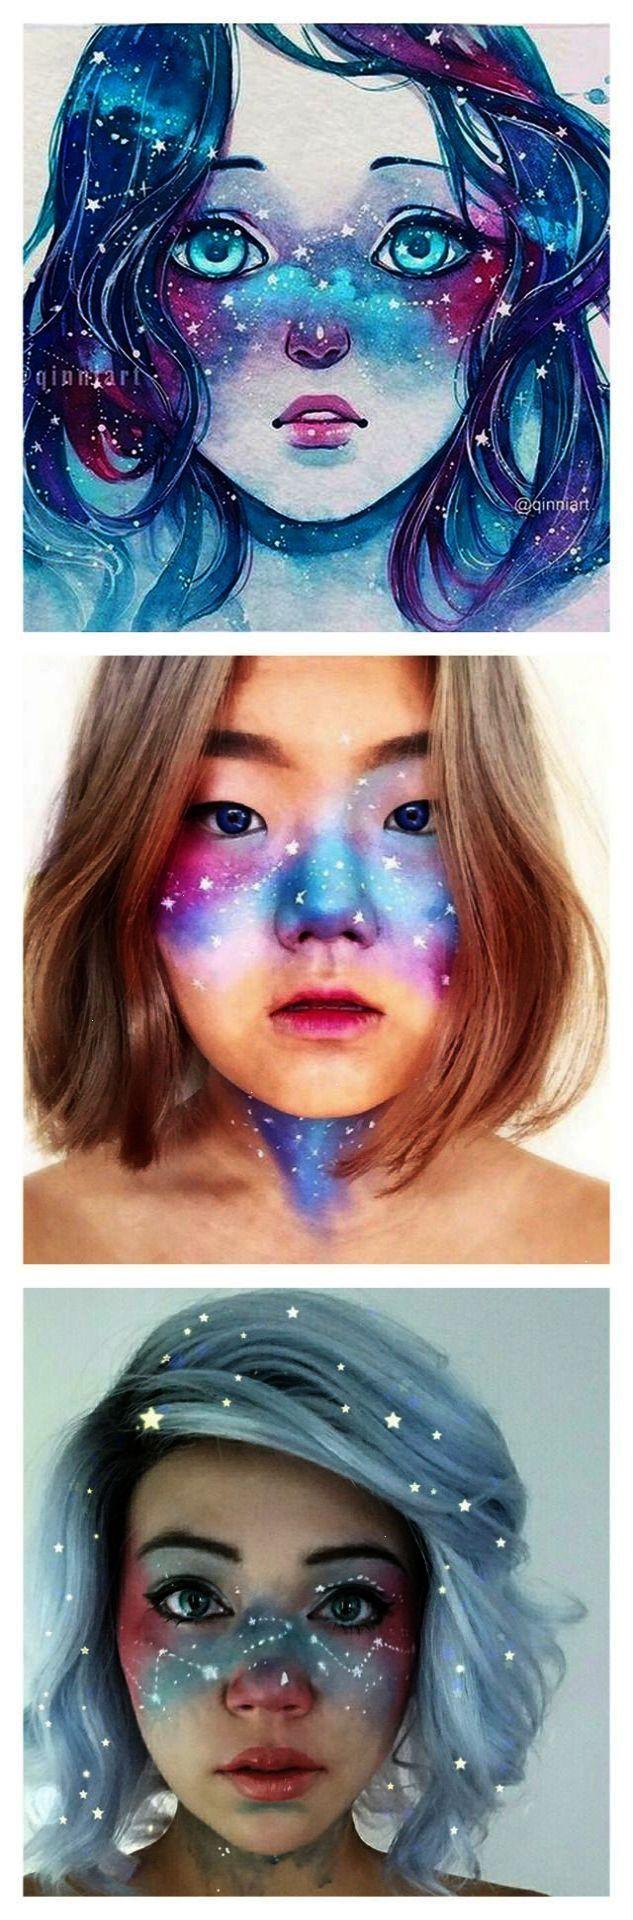 best makeup images on pinterest artistic make up fairy makeup